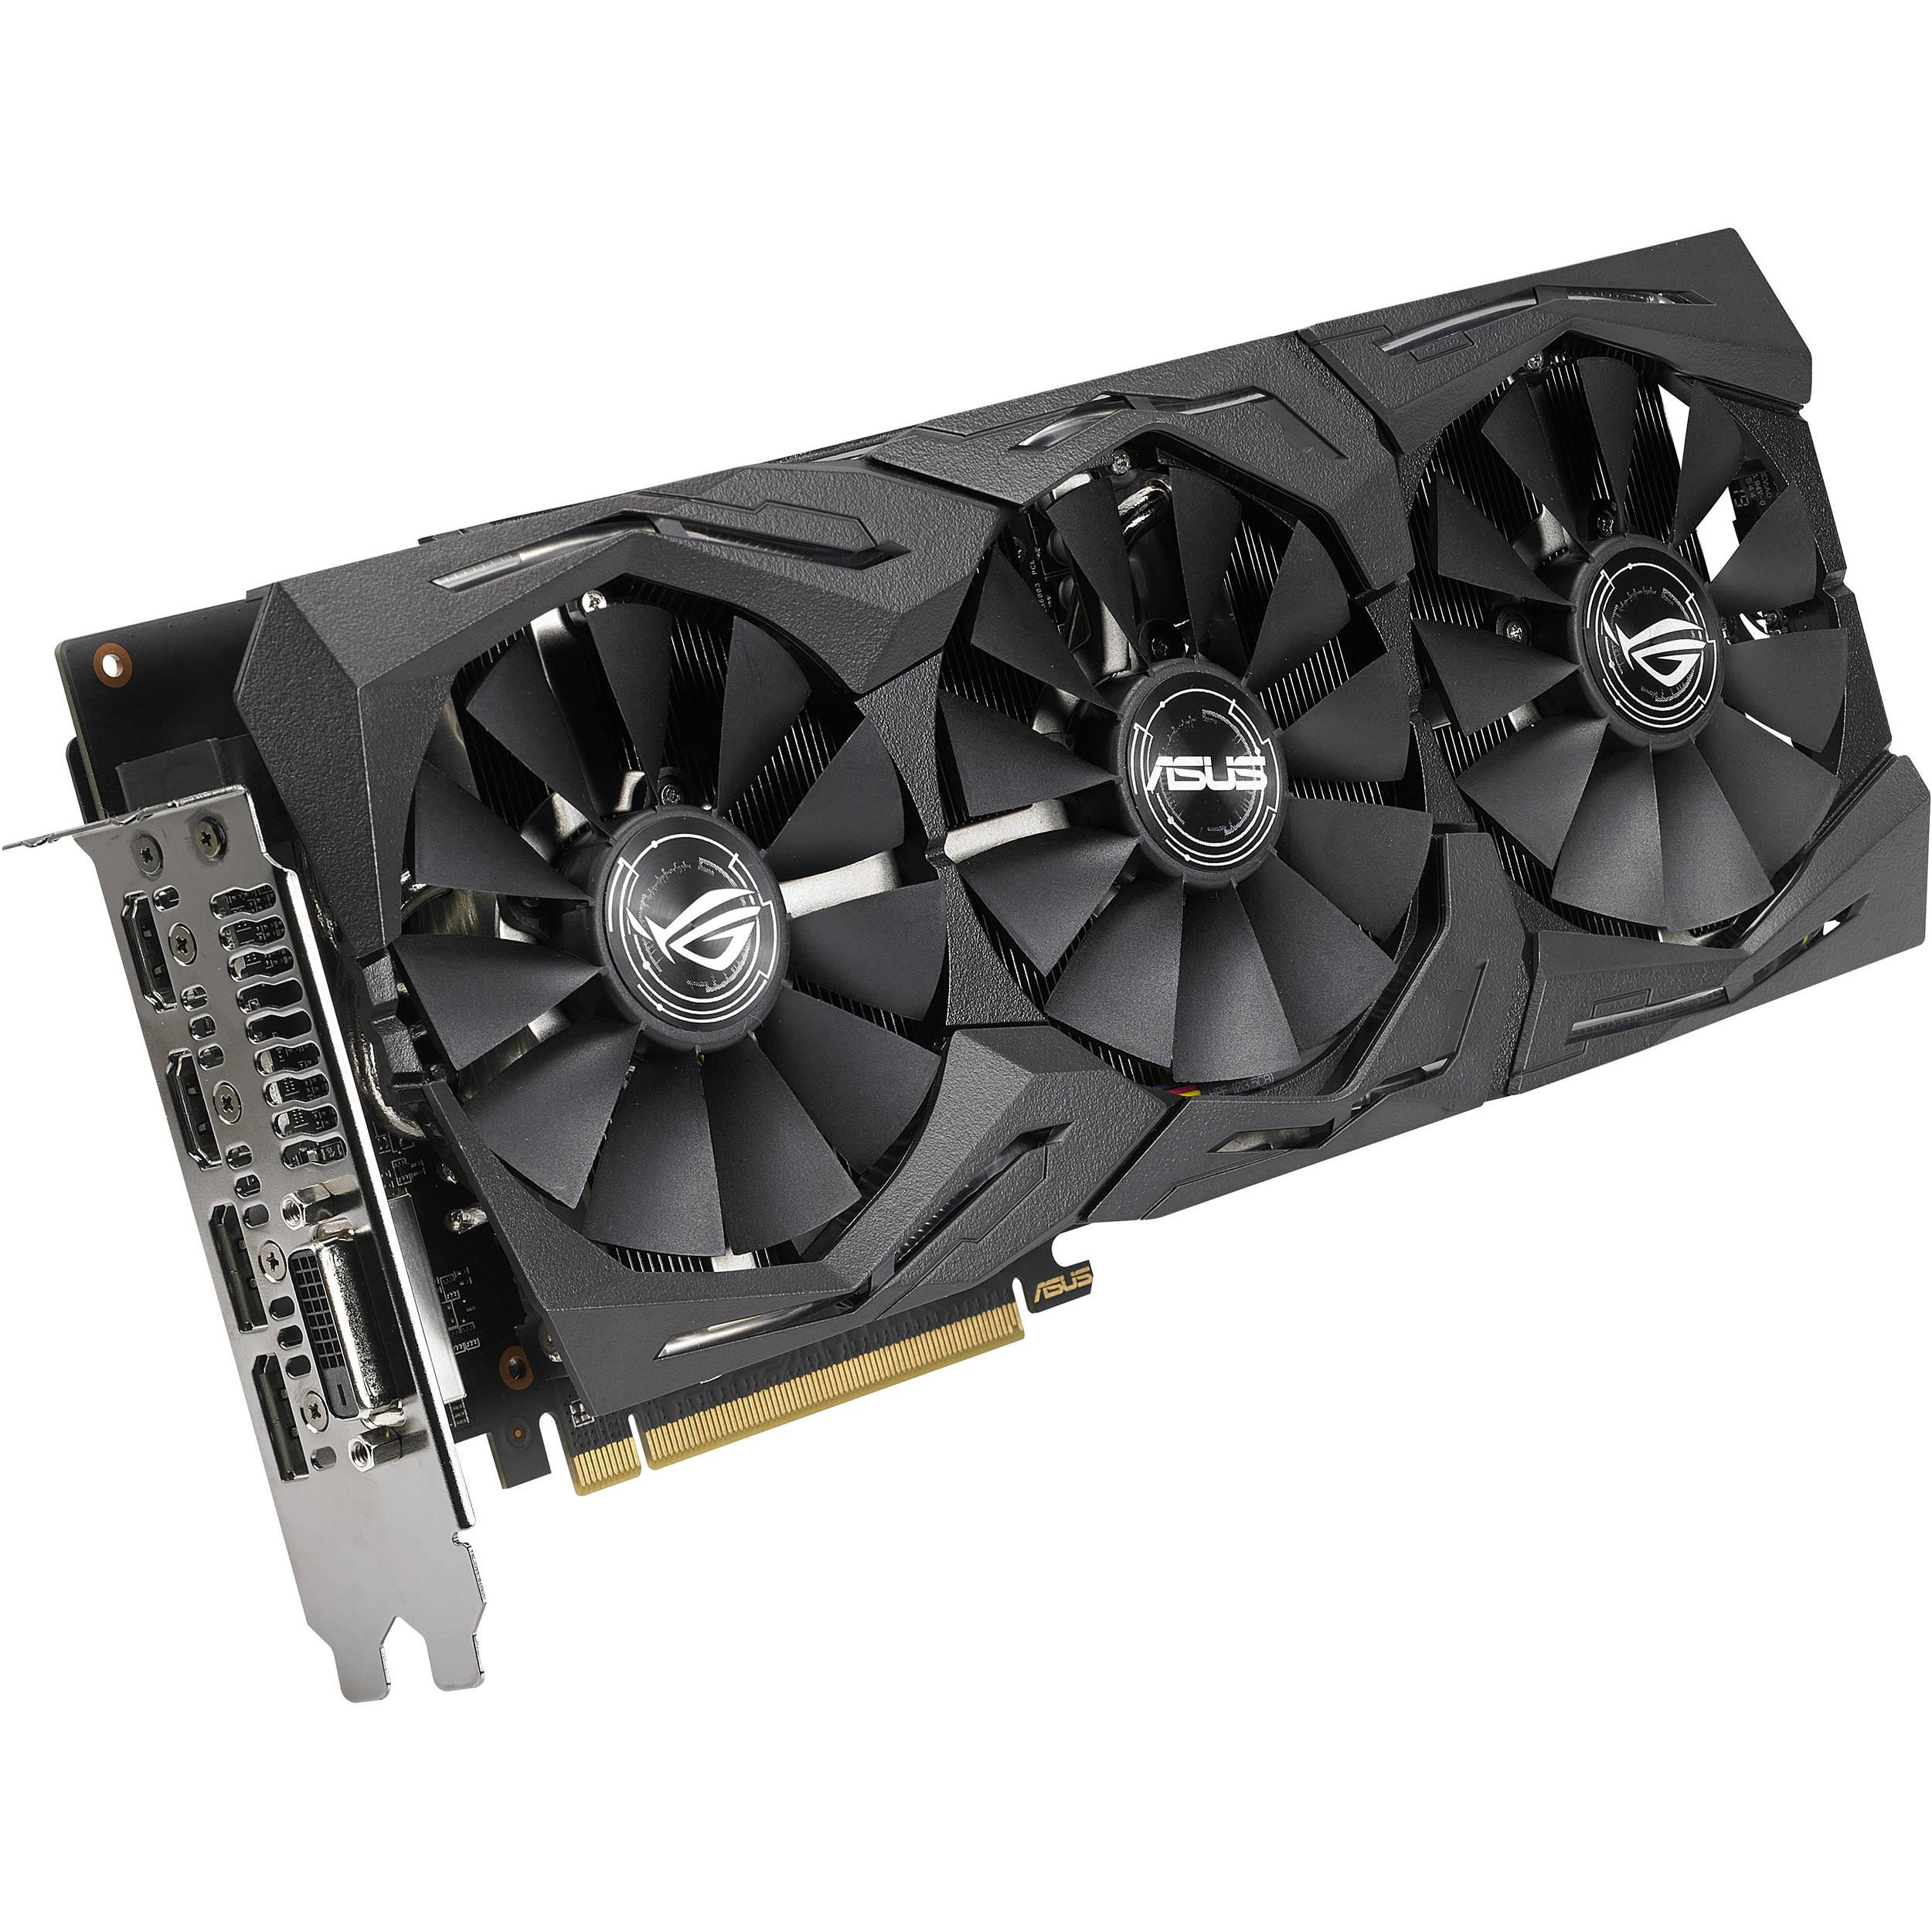 ASUS ROG Strix Radeon RX 580 O8G Gaming OC Edition 8GB GDDR5 AMD Graphics Card